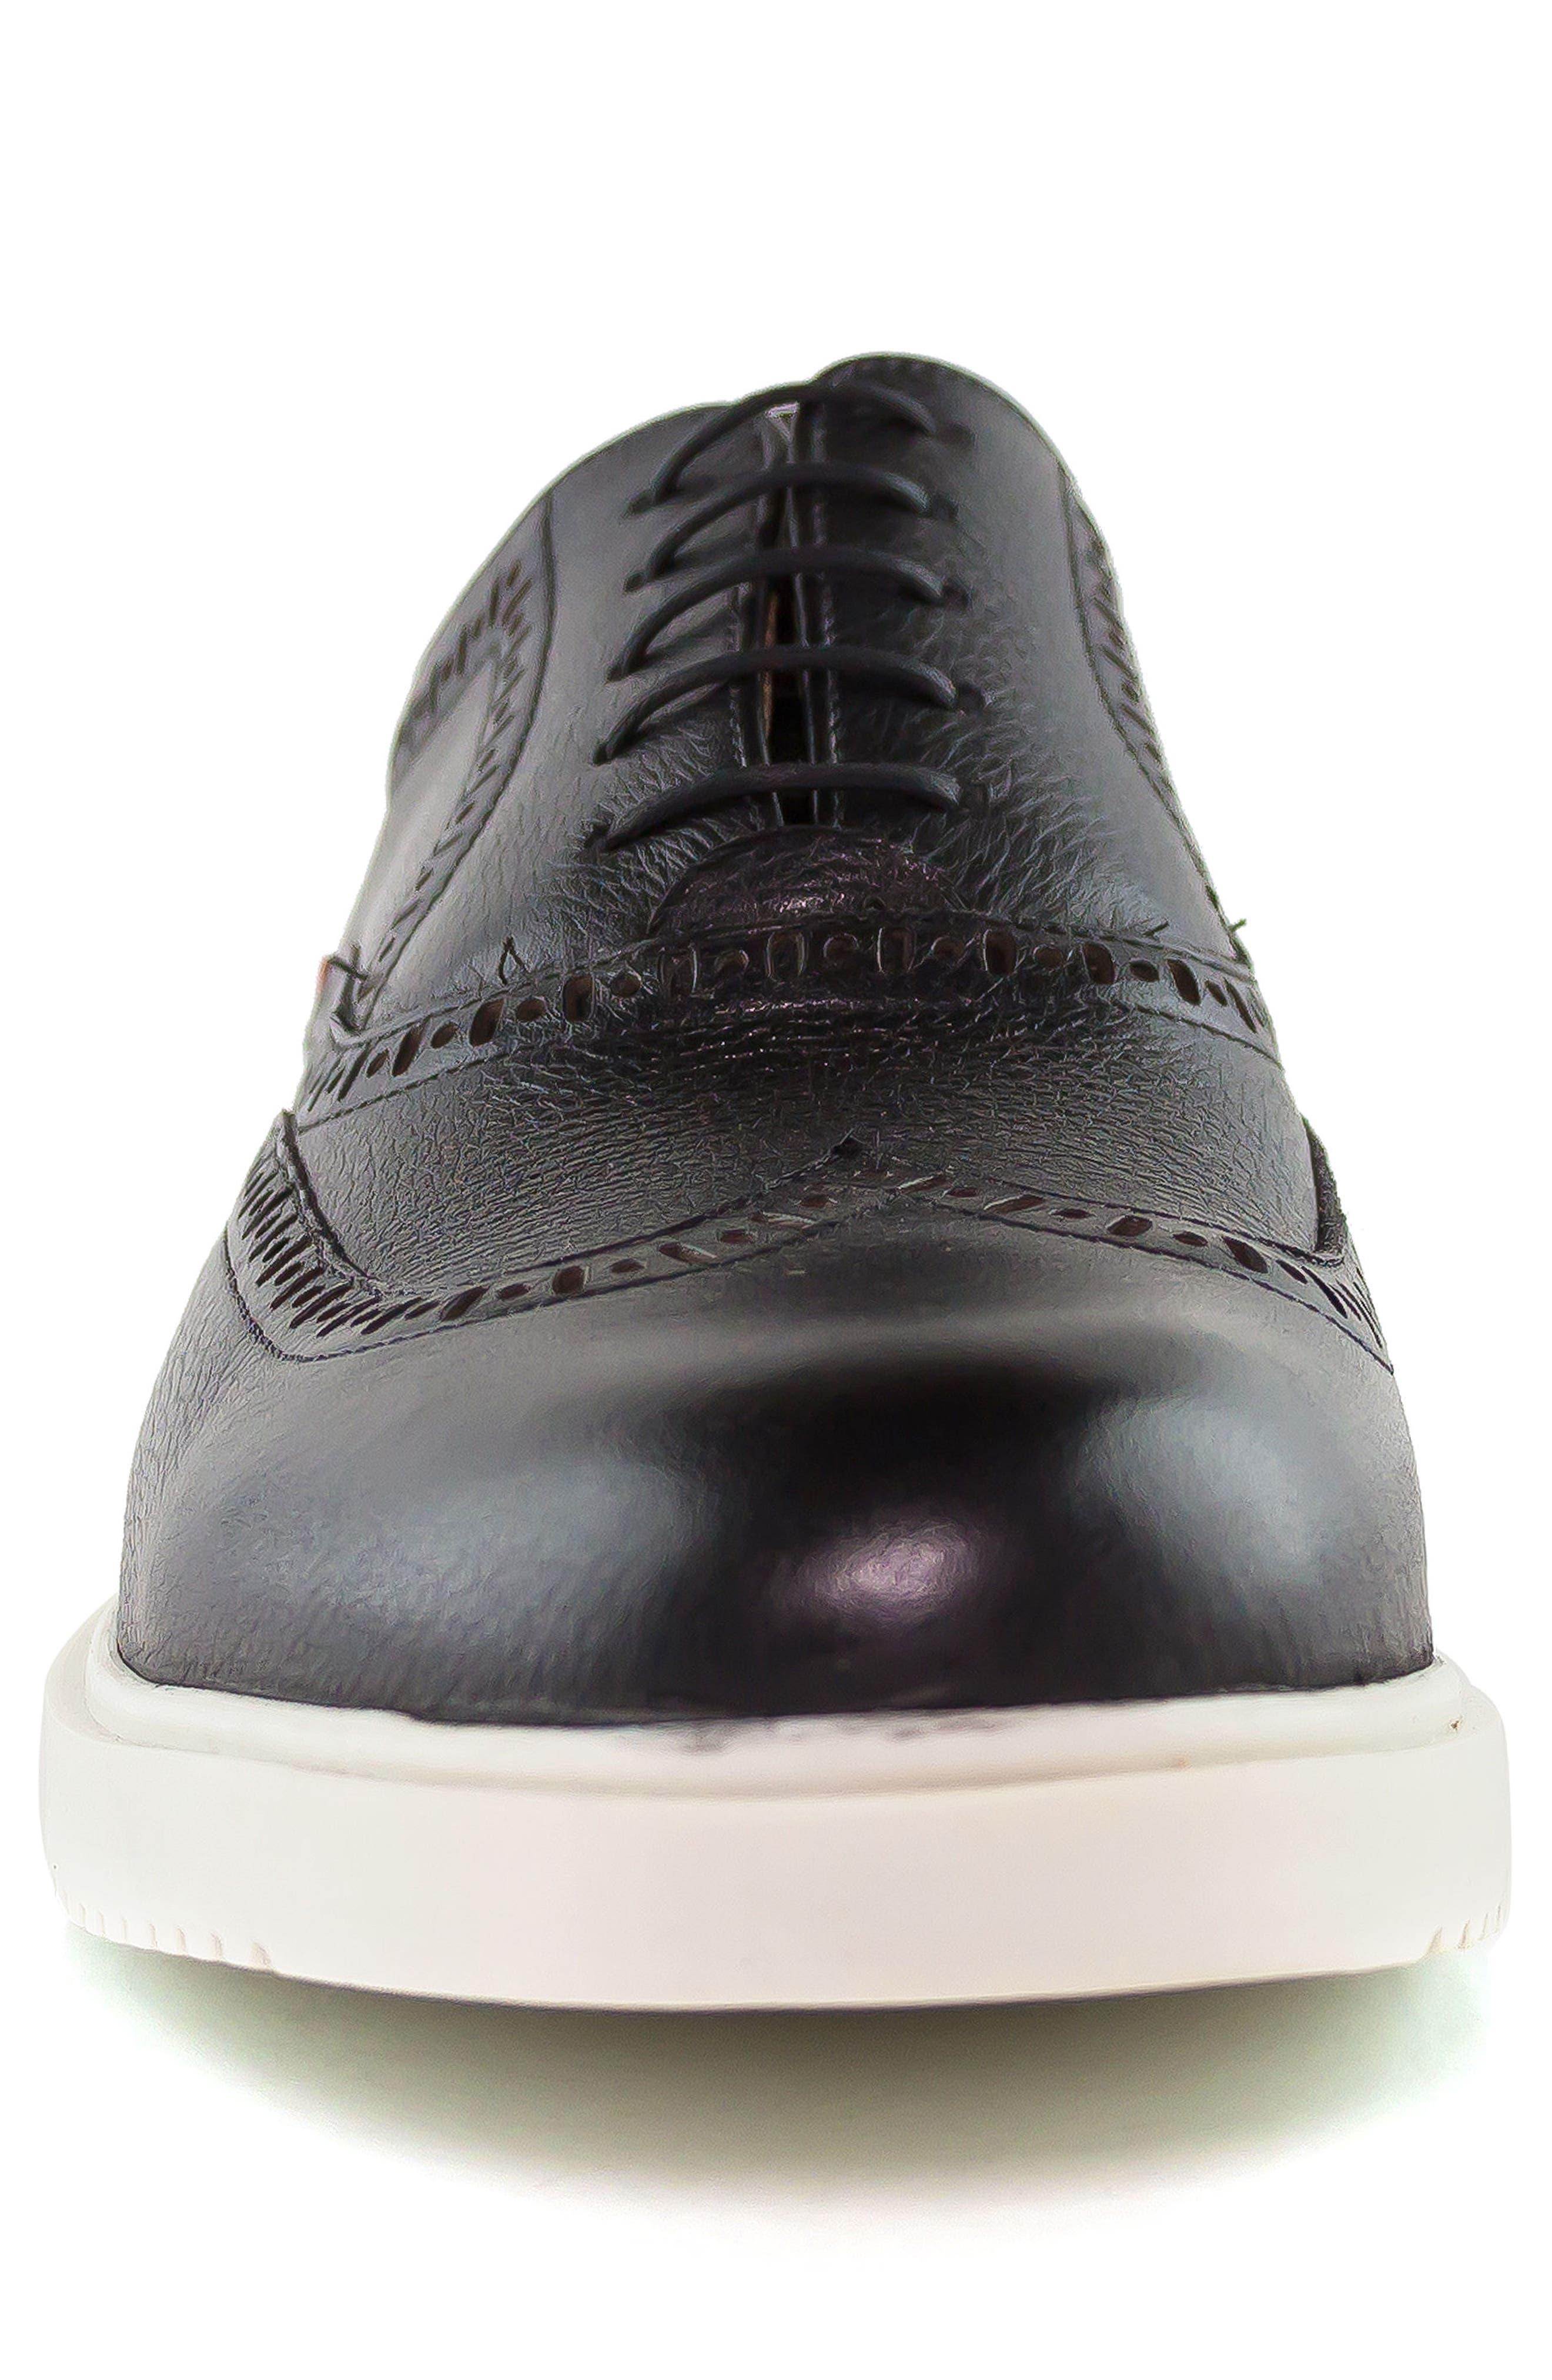 5th Ave Wingtip Sneaker,                             Alternate thumbnail 13, color,